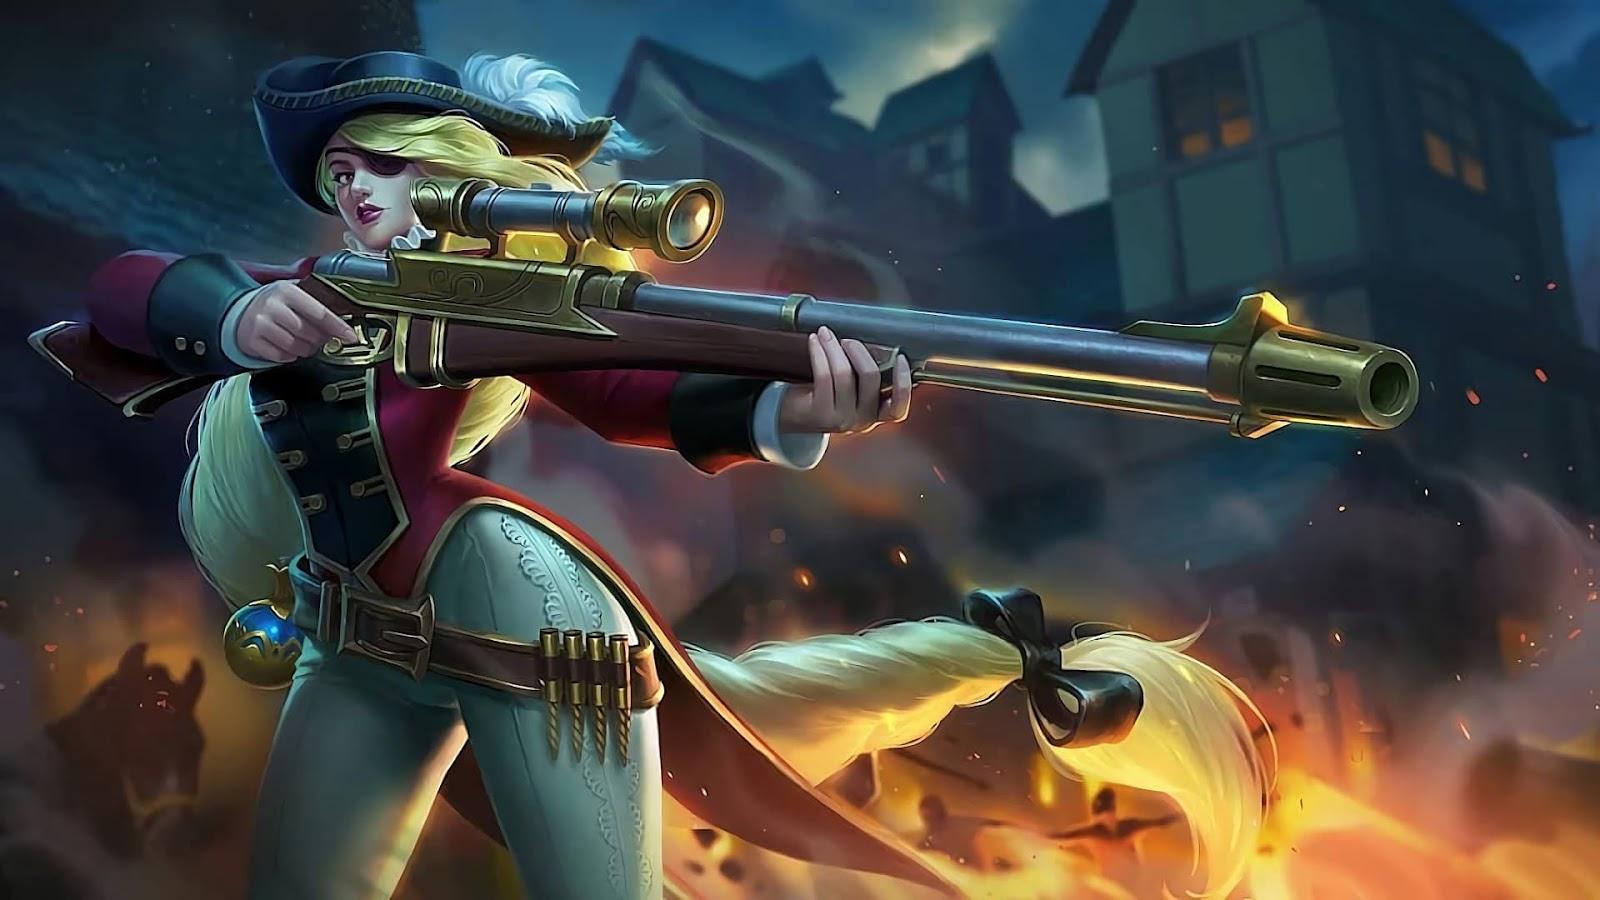 Wallpaper Lesley Royal Musketeer Skin Mobile Legends HD for PC